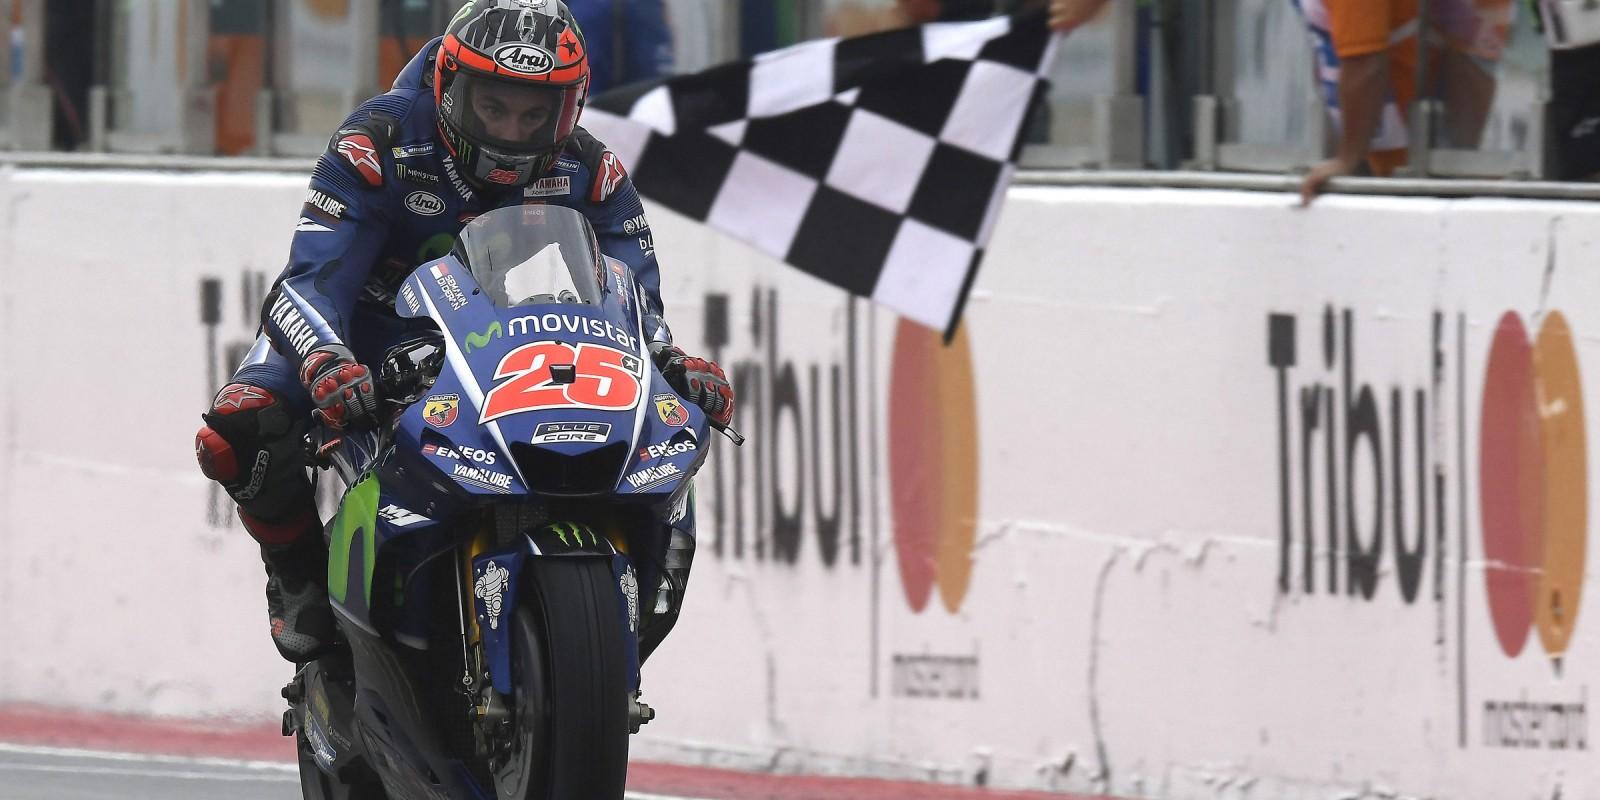 Maverick Viñales at the 2017 GP S.Marino e Riviera di Rimini